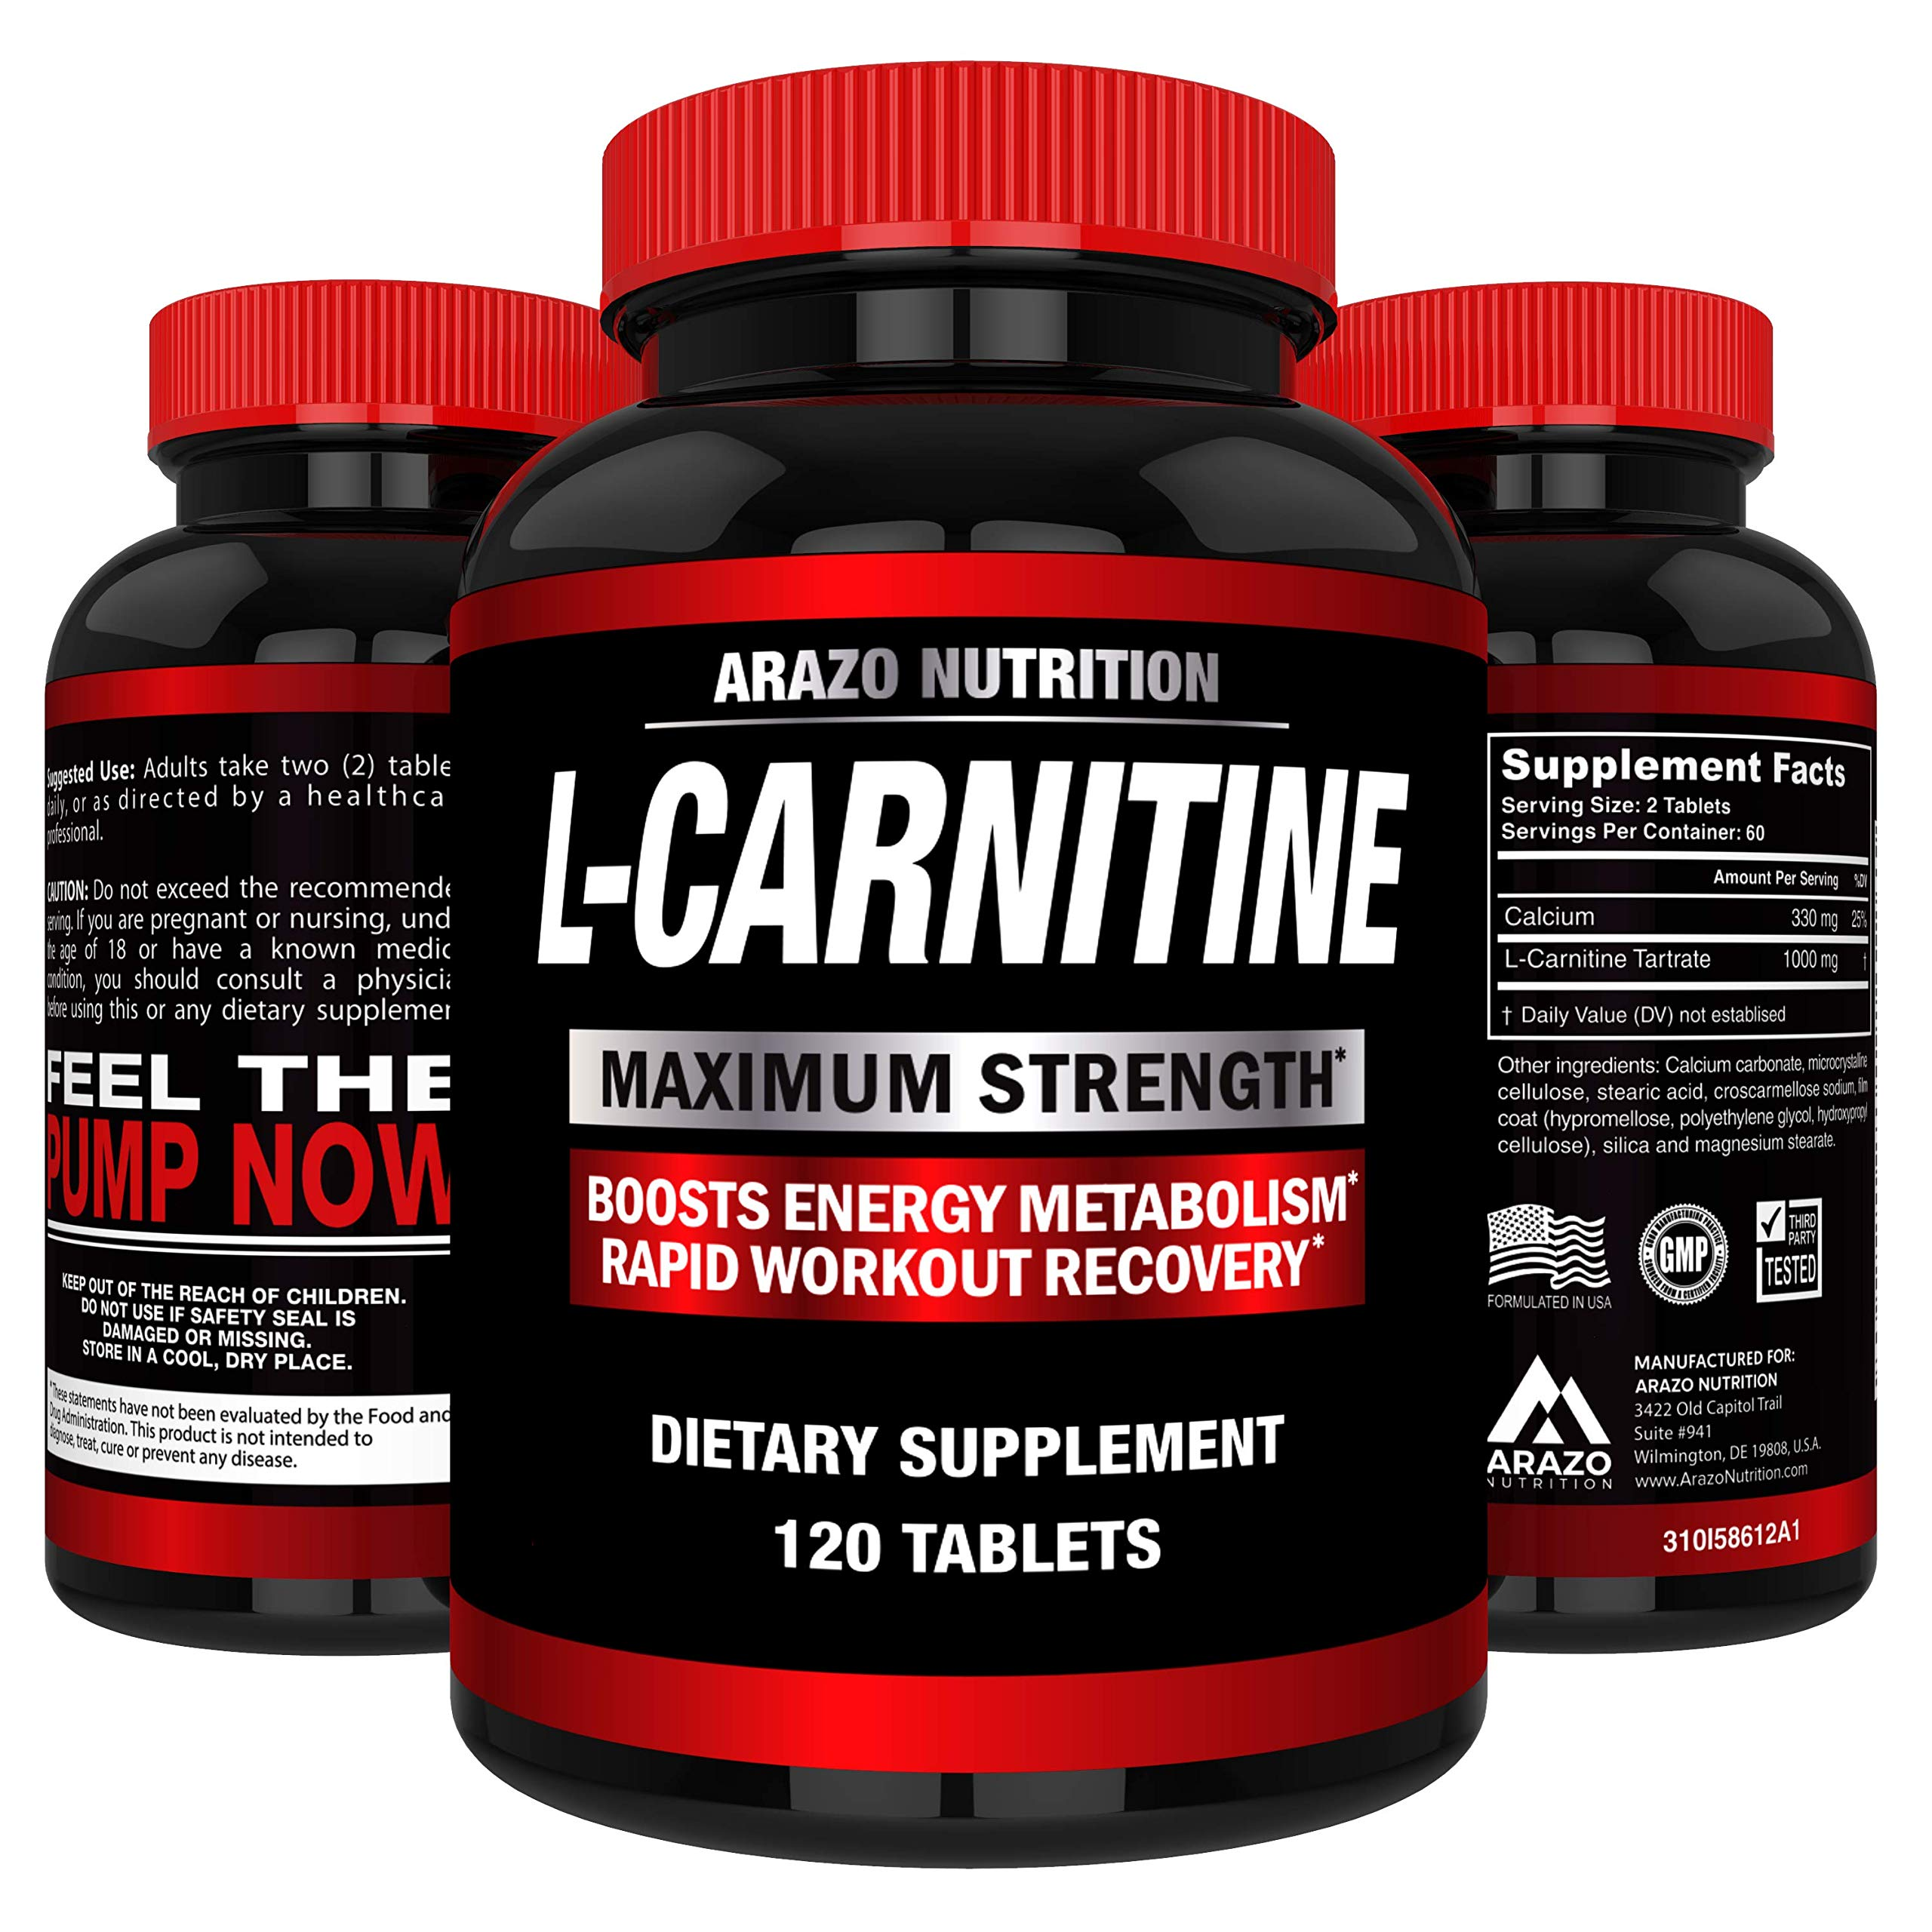 L-Carnitine 1000mg Servings 120 Tablets - Carnitine Amino Acid - Arazo Nutrition USA by Arazo Nutrition